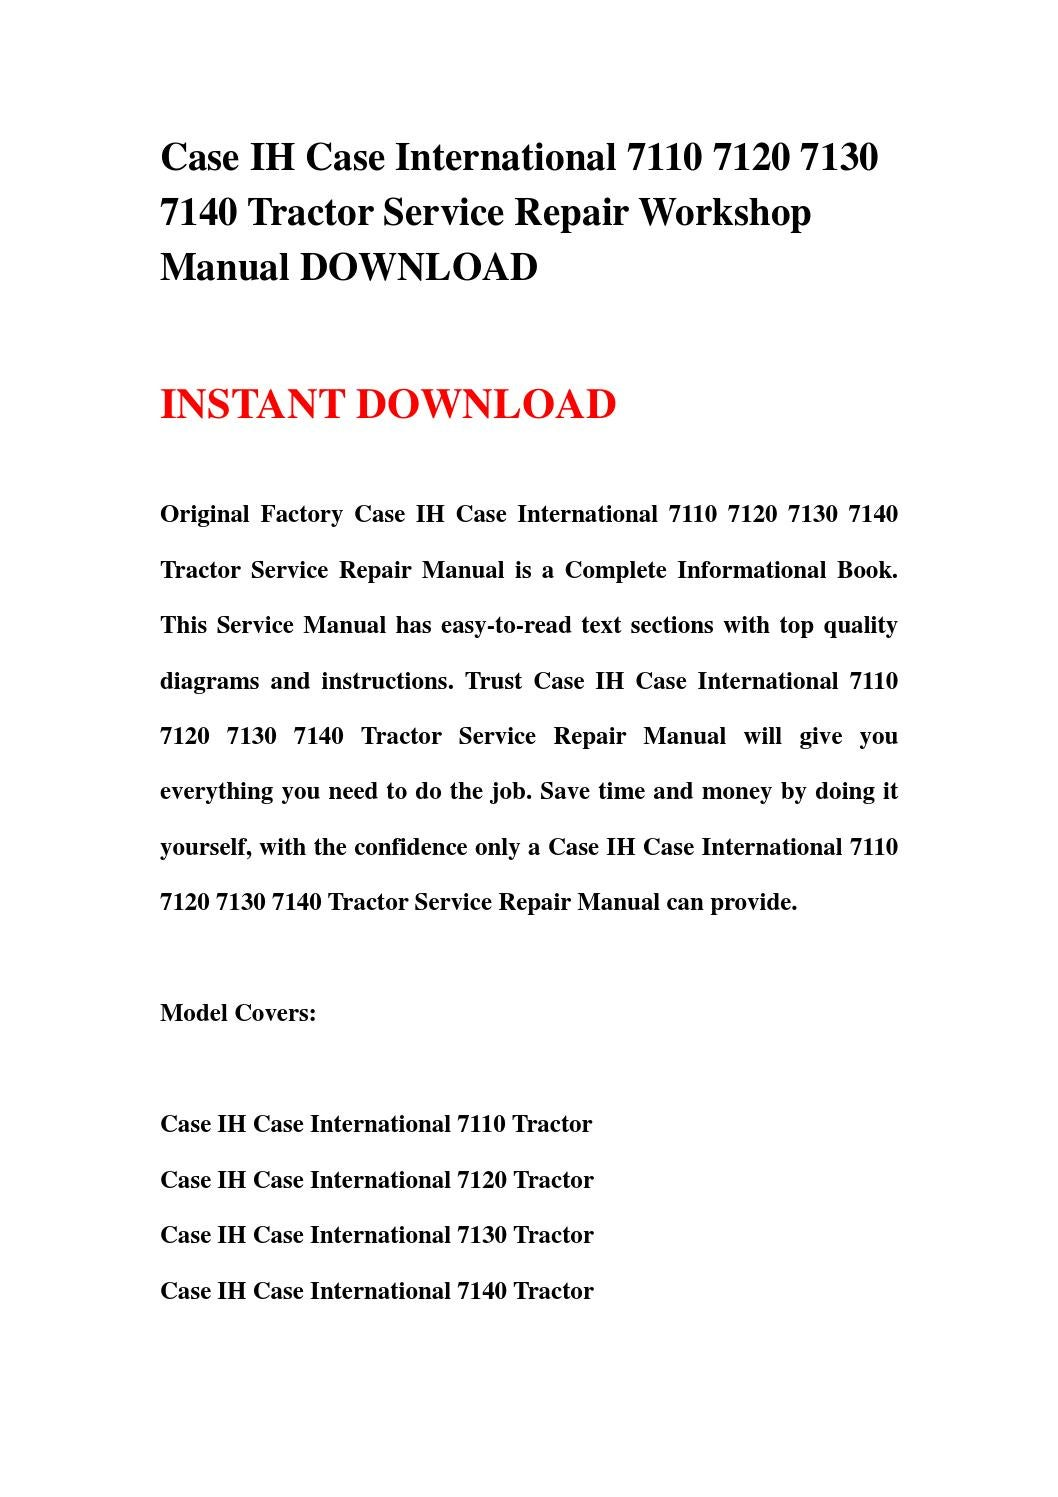 Case Ih Case International 7110 7120 7130 7140 Tractor Service Repair Workshop Manual Download